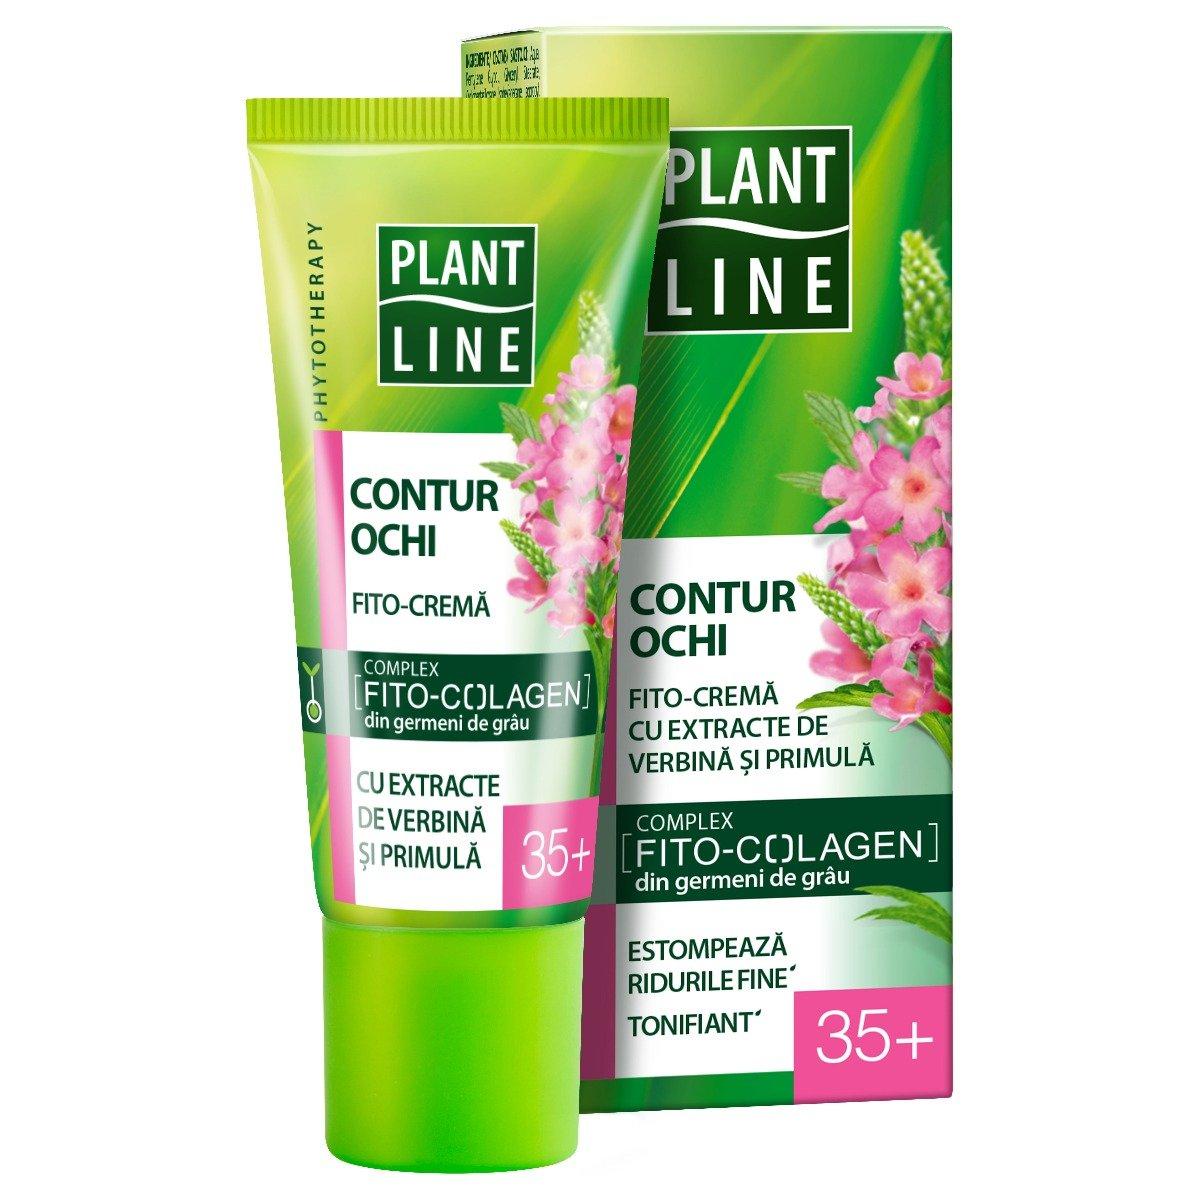 Crema de ochi Plant Line Verbina, 35+, 20 ml imagine